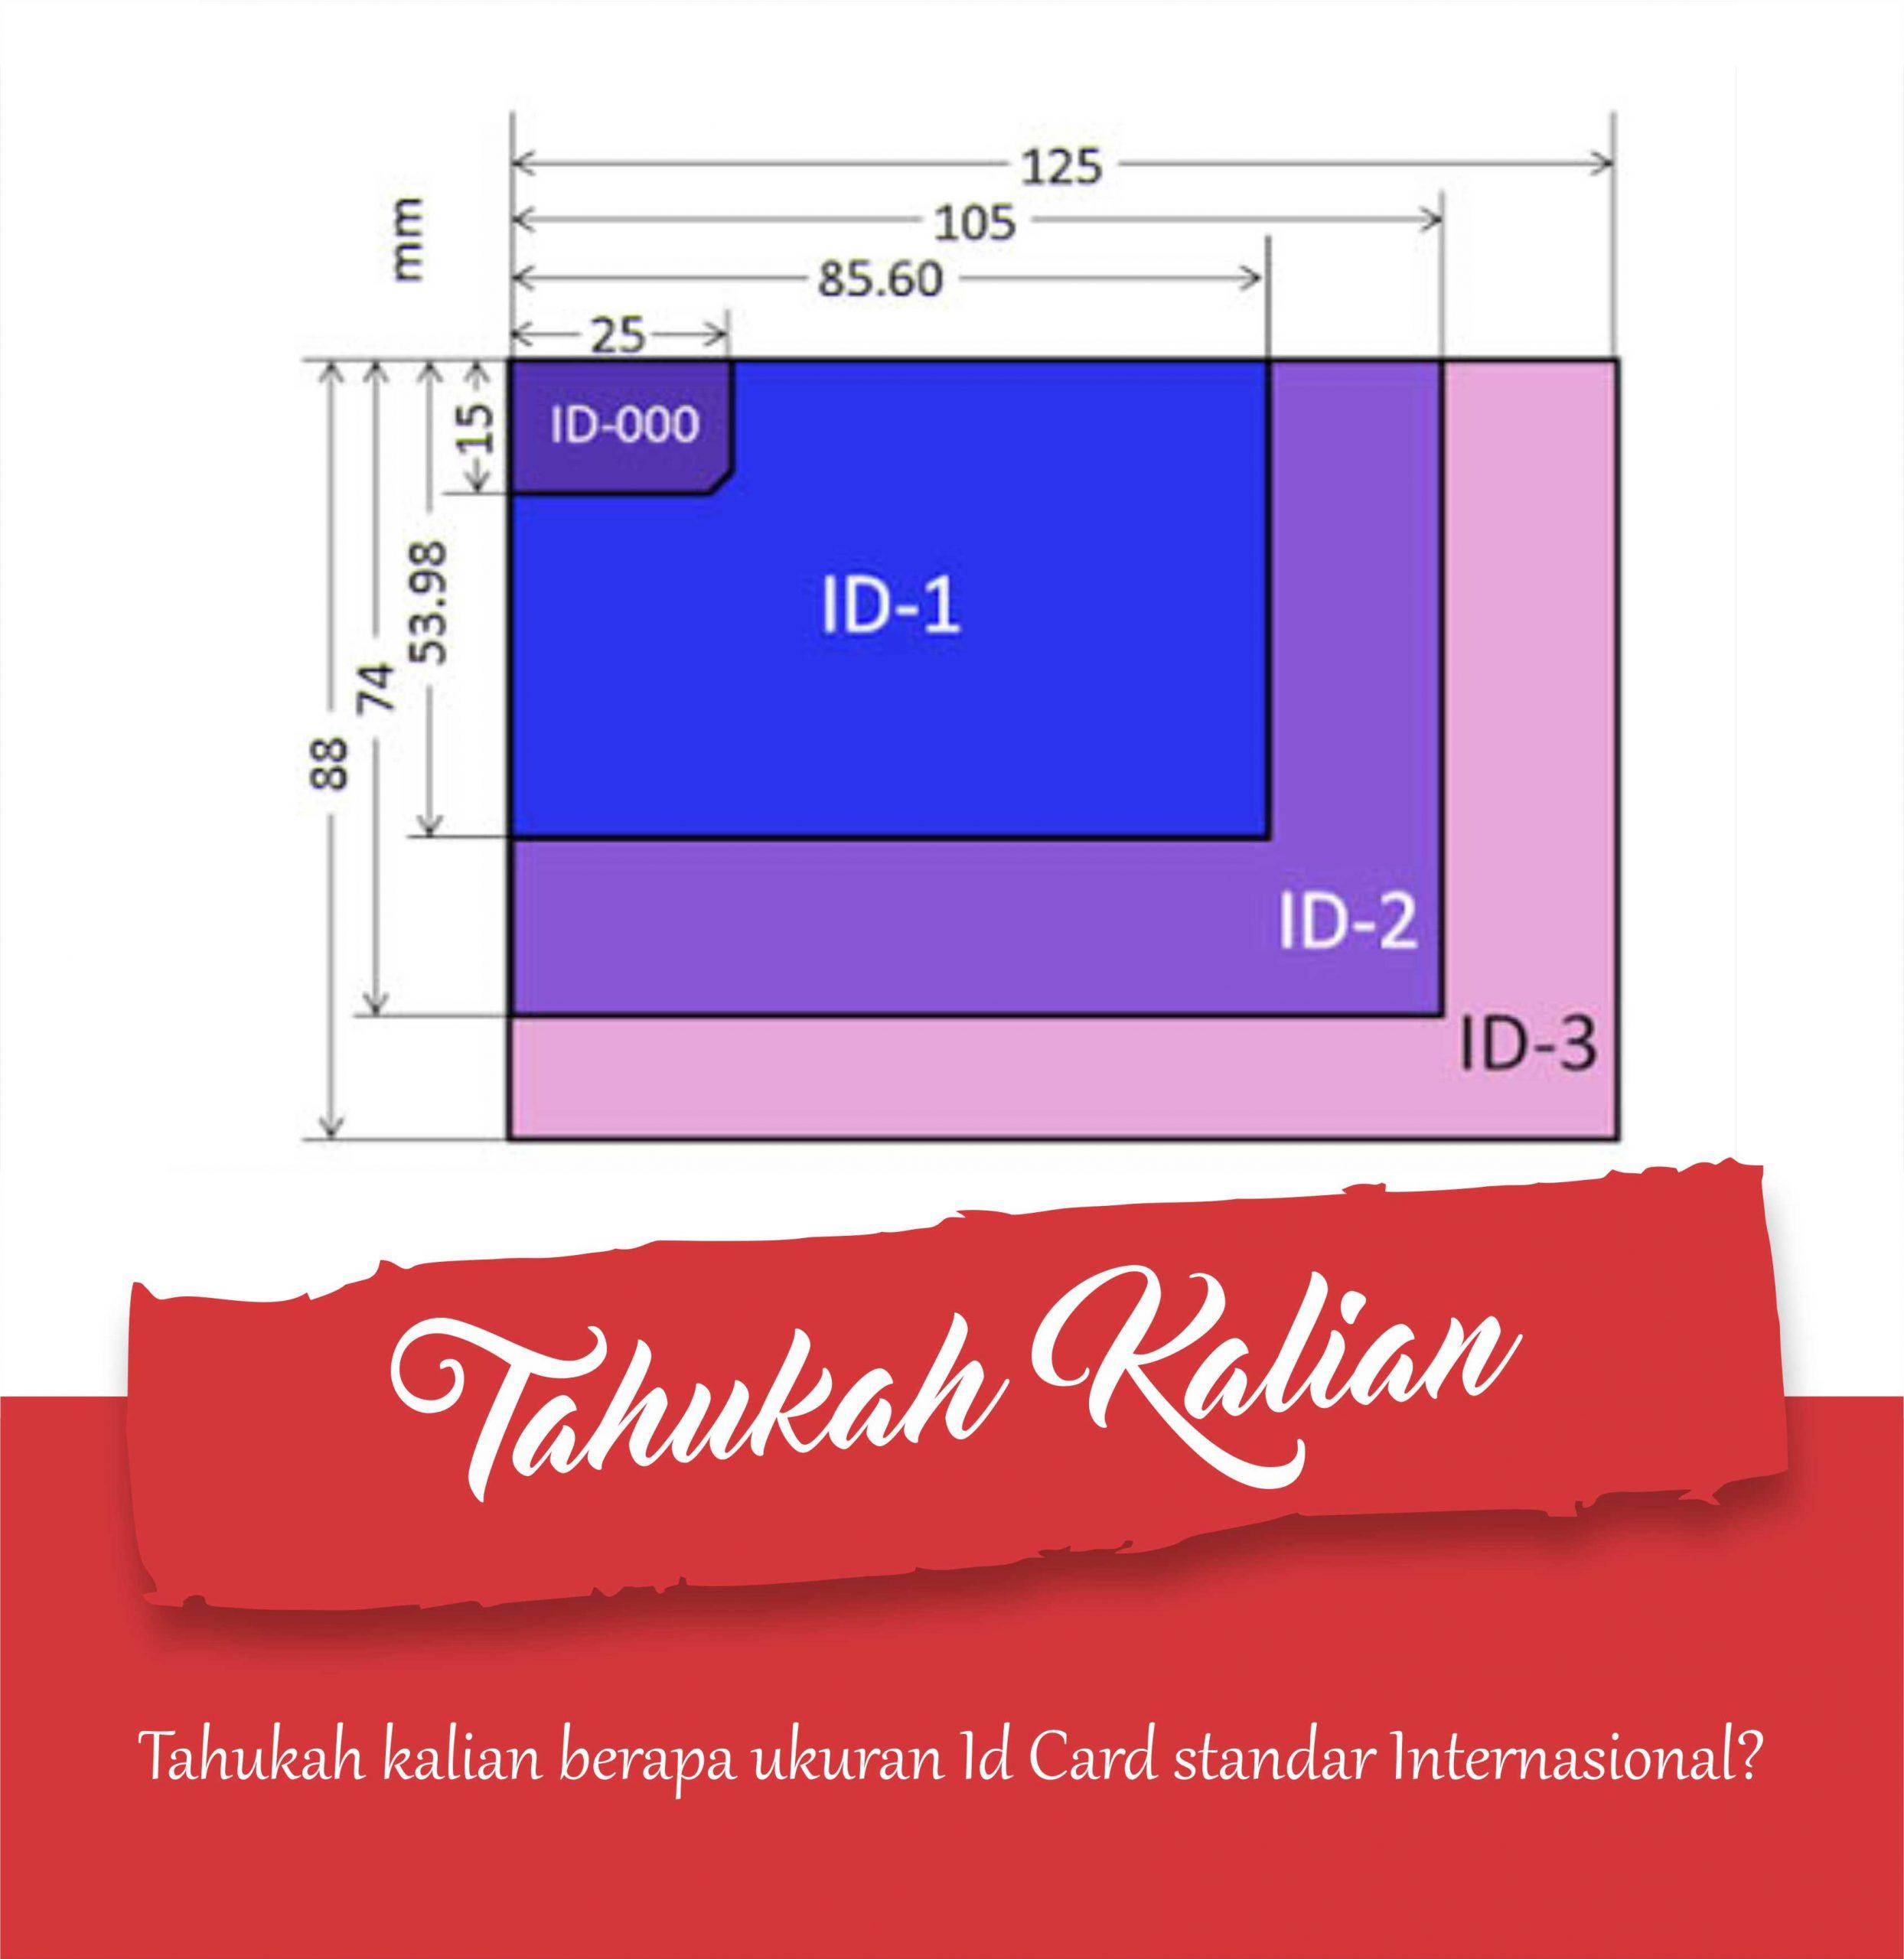 Ukuran ID Card Standar International